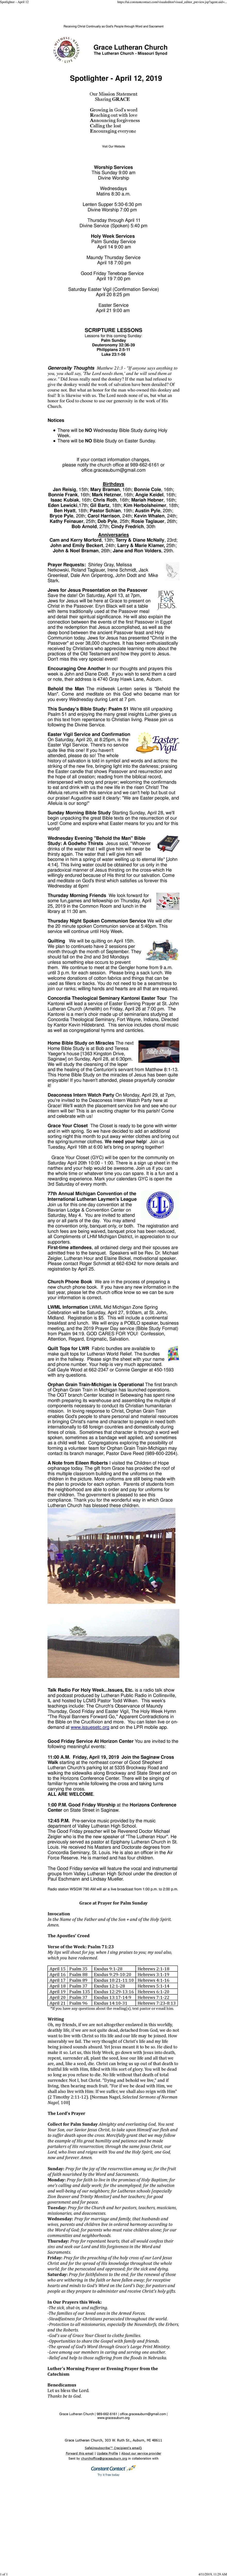 Spotlighter - April 12-page-001.jpg